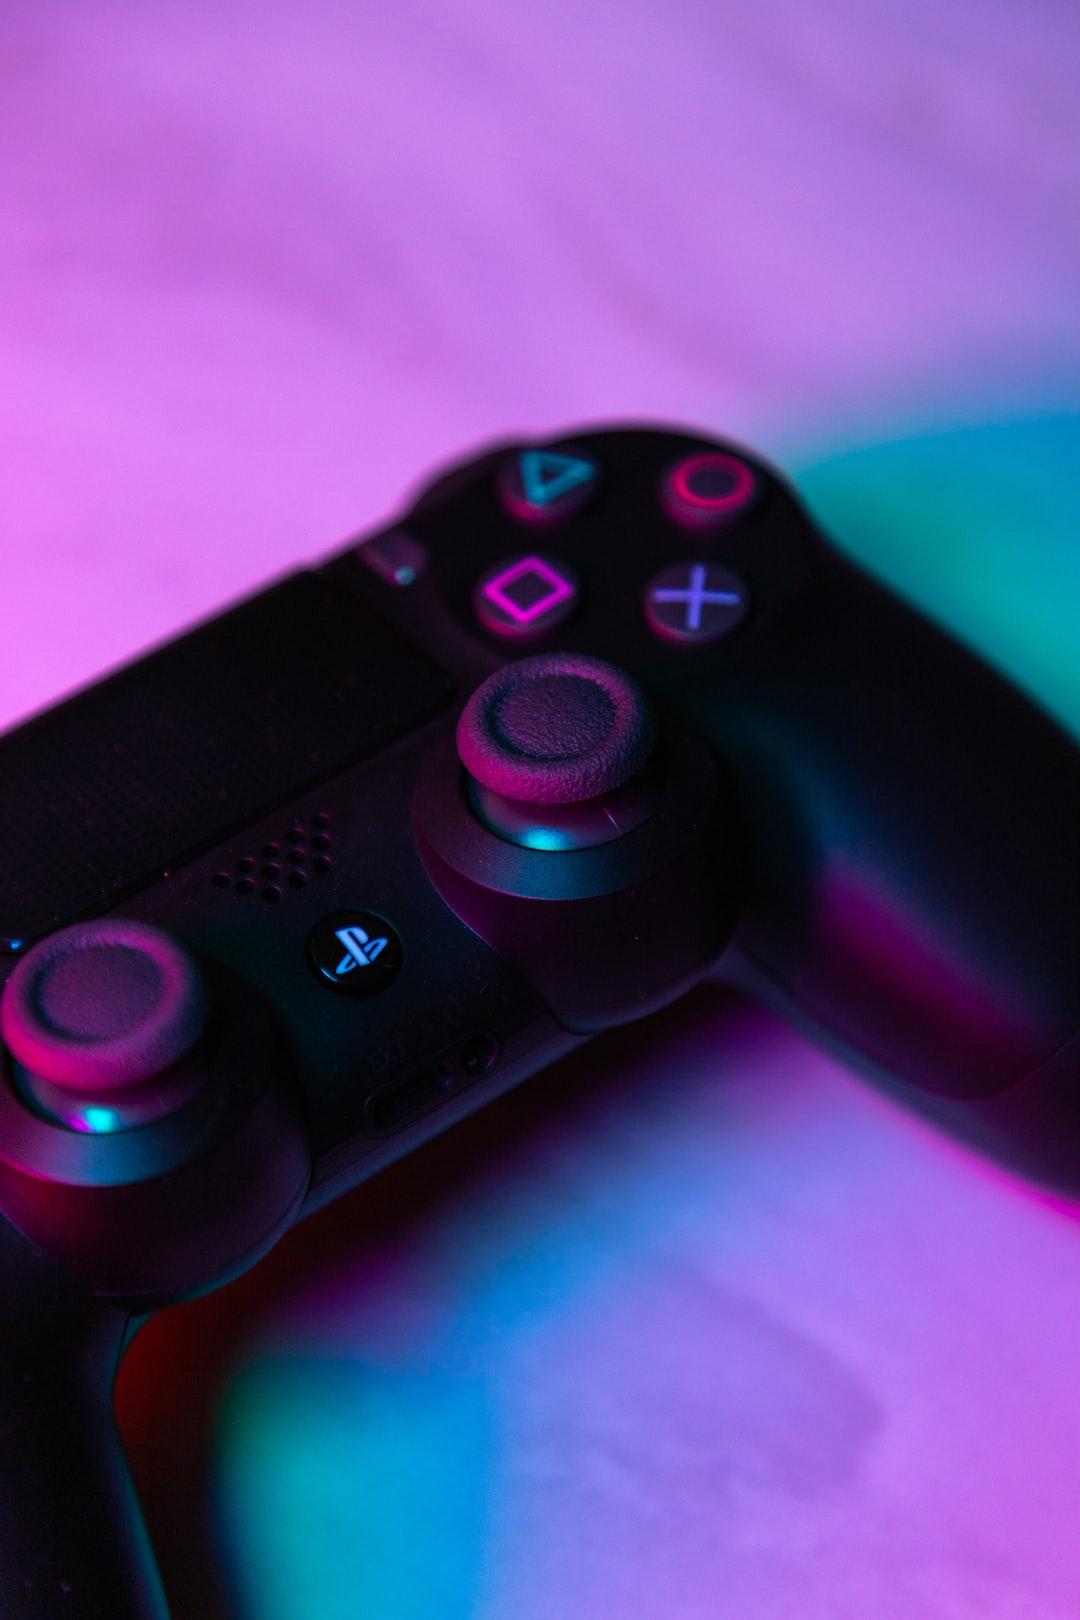 Gaming Apps Cash In, Consumer Spending Hit $100B in 2020